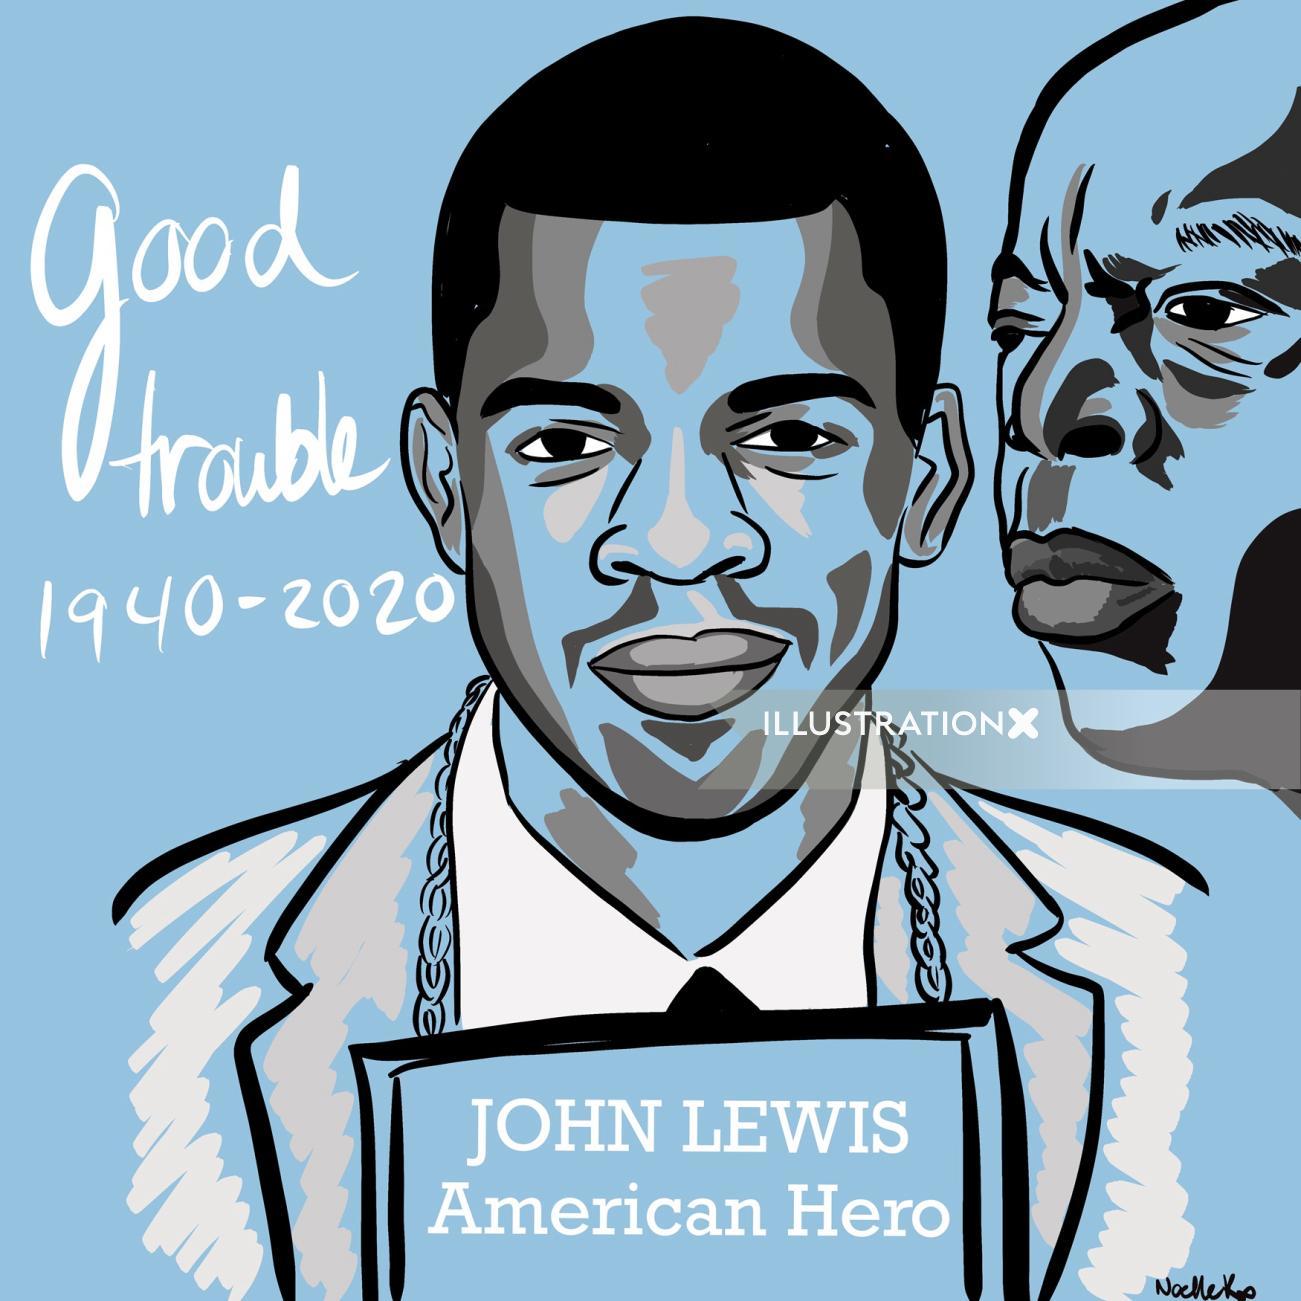 John Lewis Portrait illustration